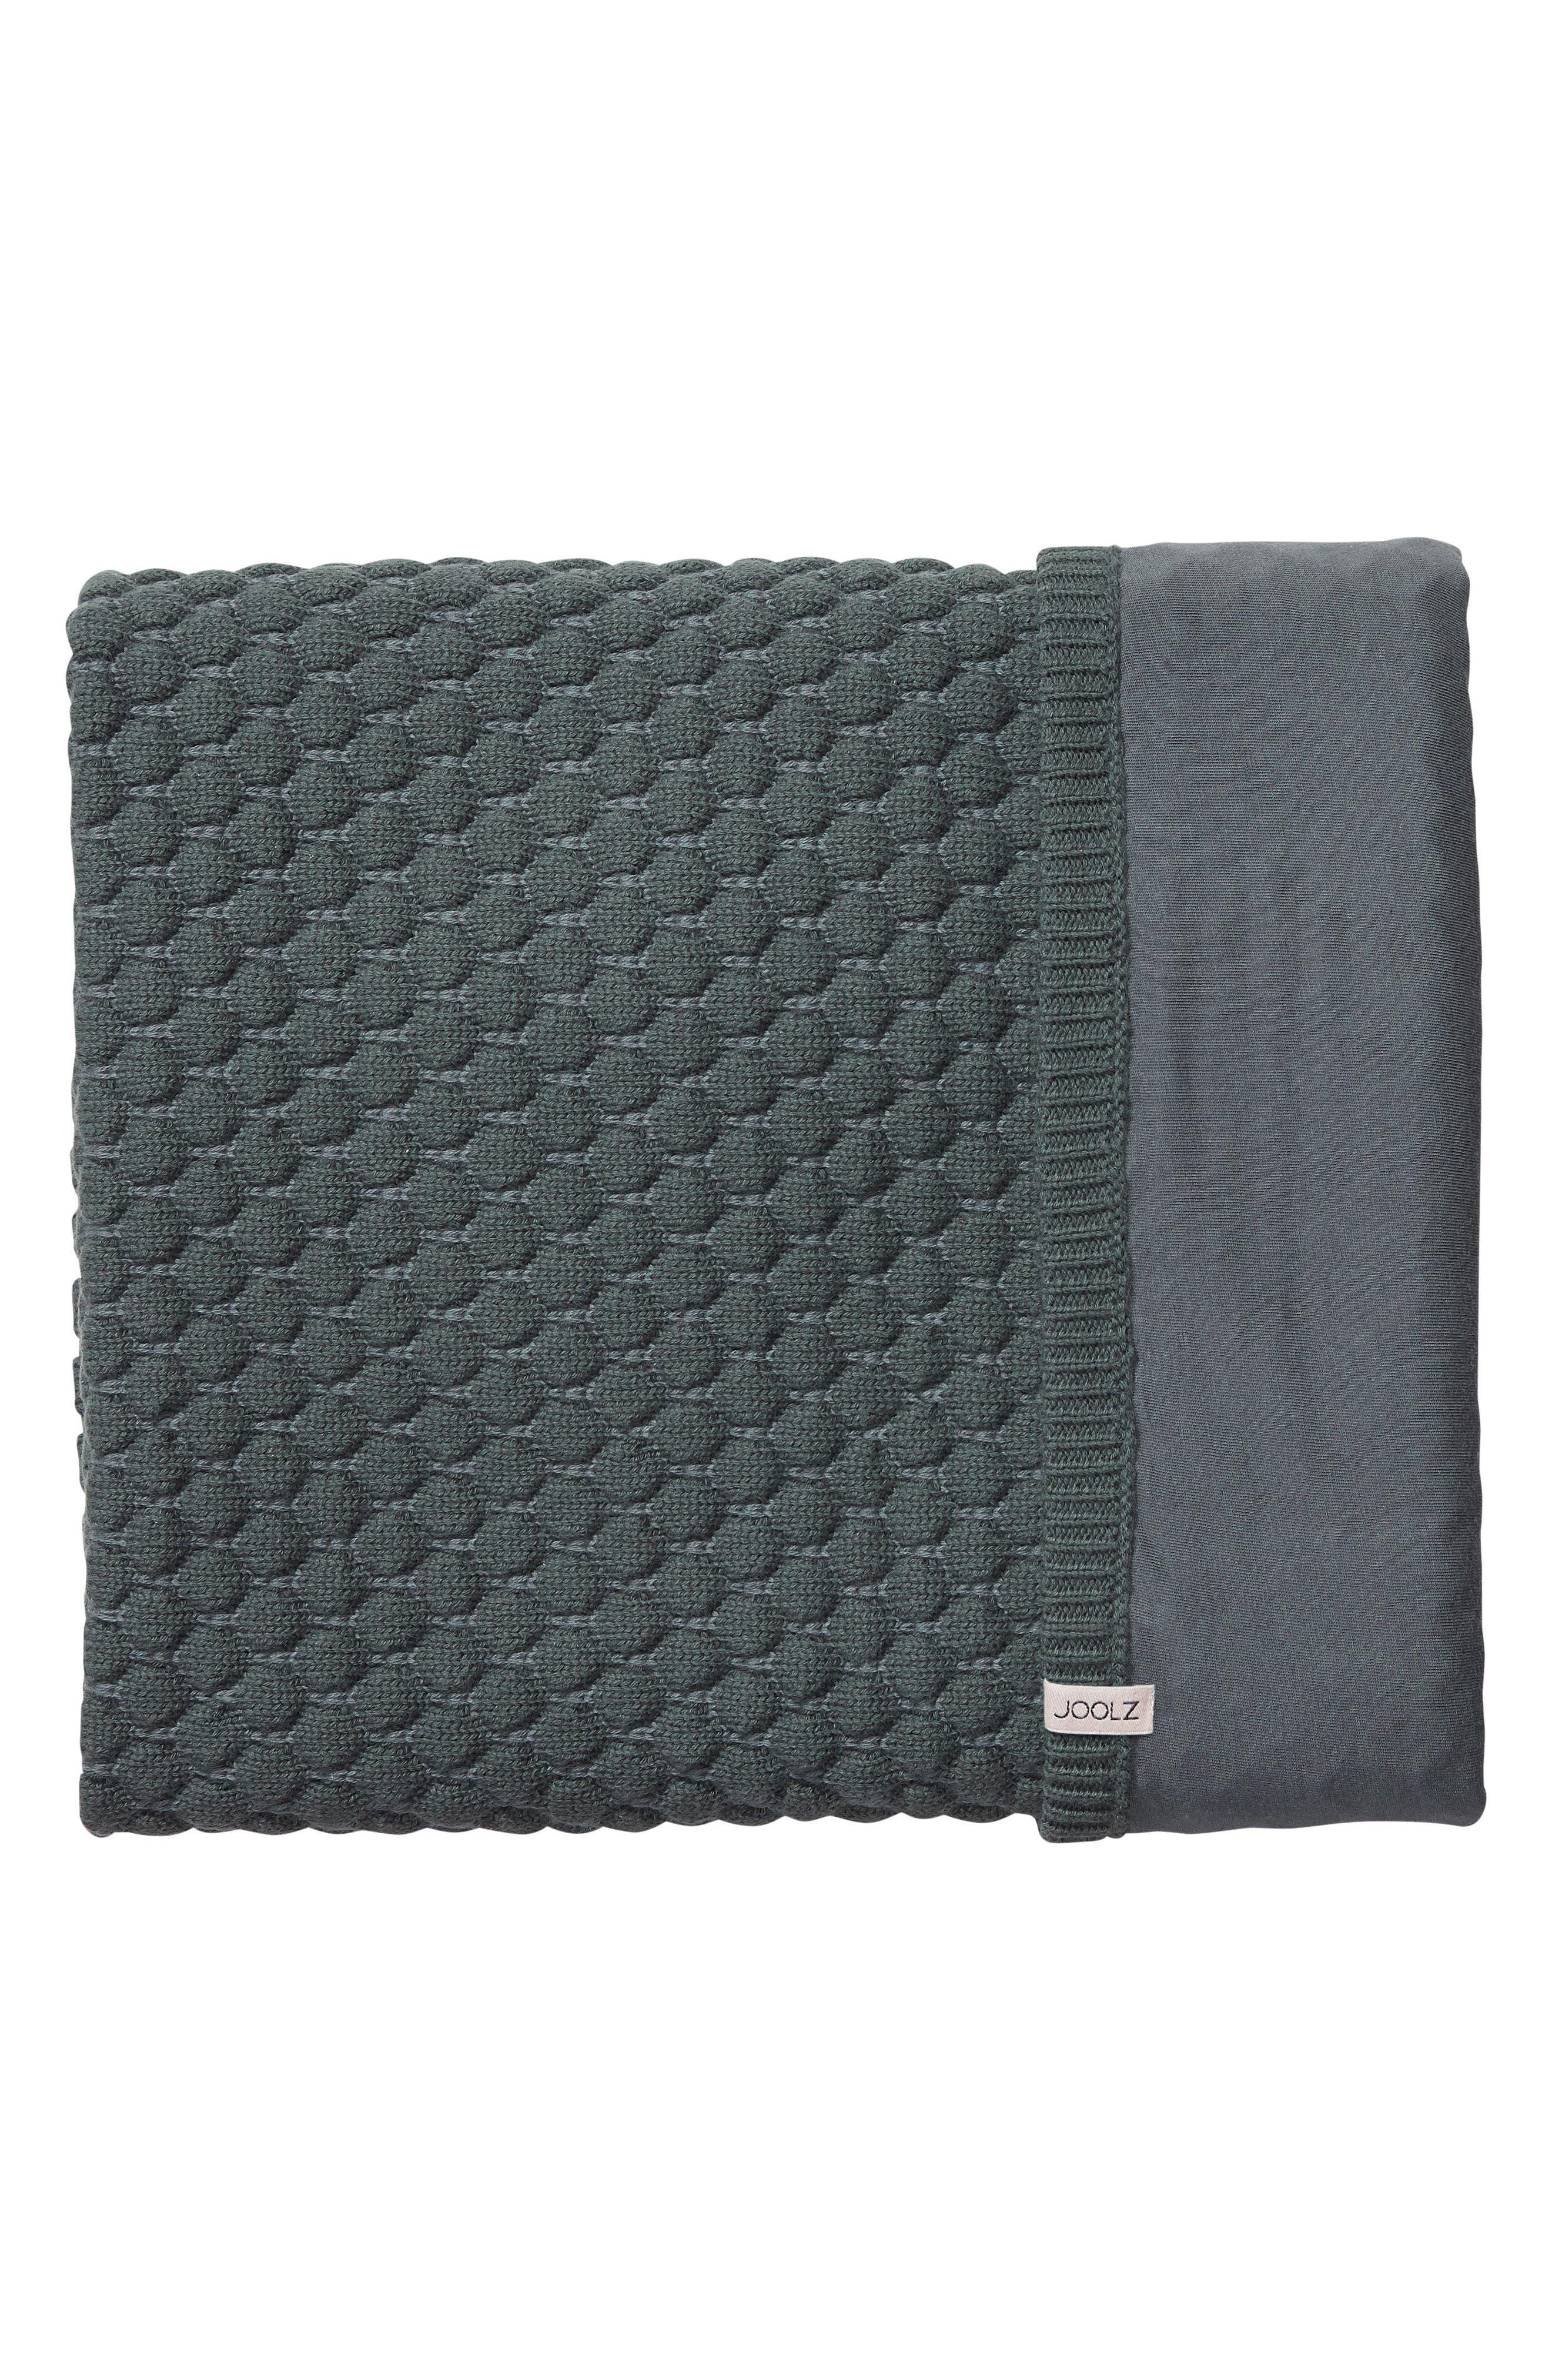 JOOLZ Essentials Honeycomb Organic Cotton Blanket, Main, color, GREY